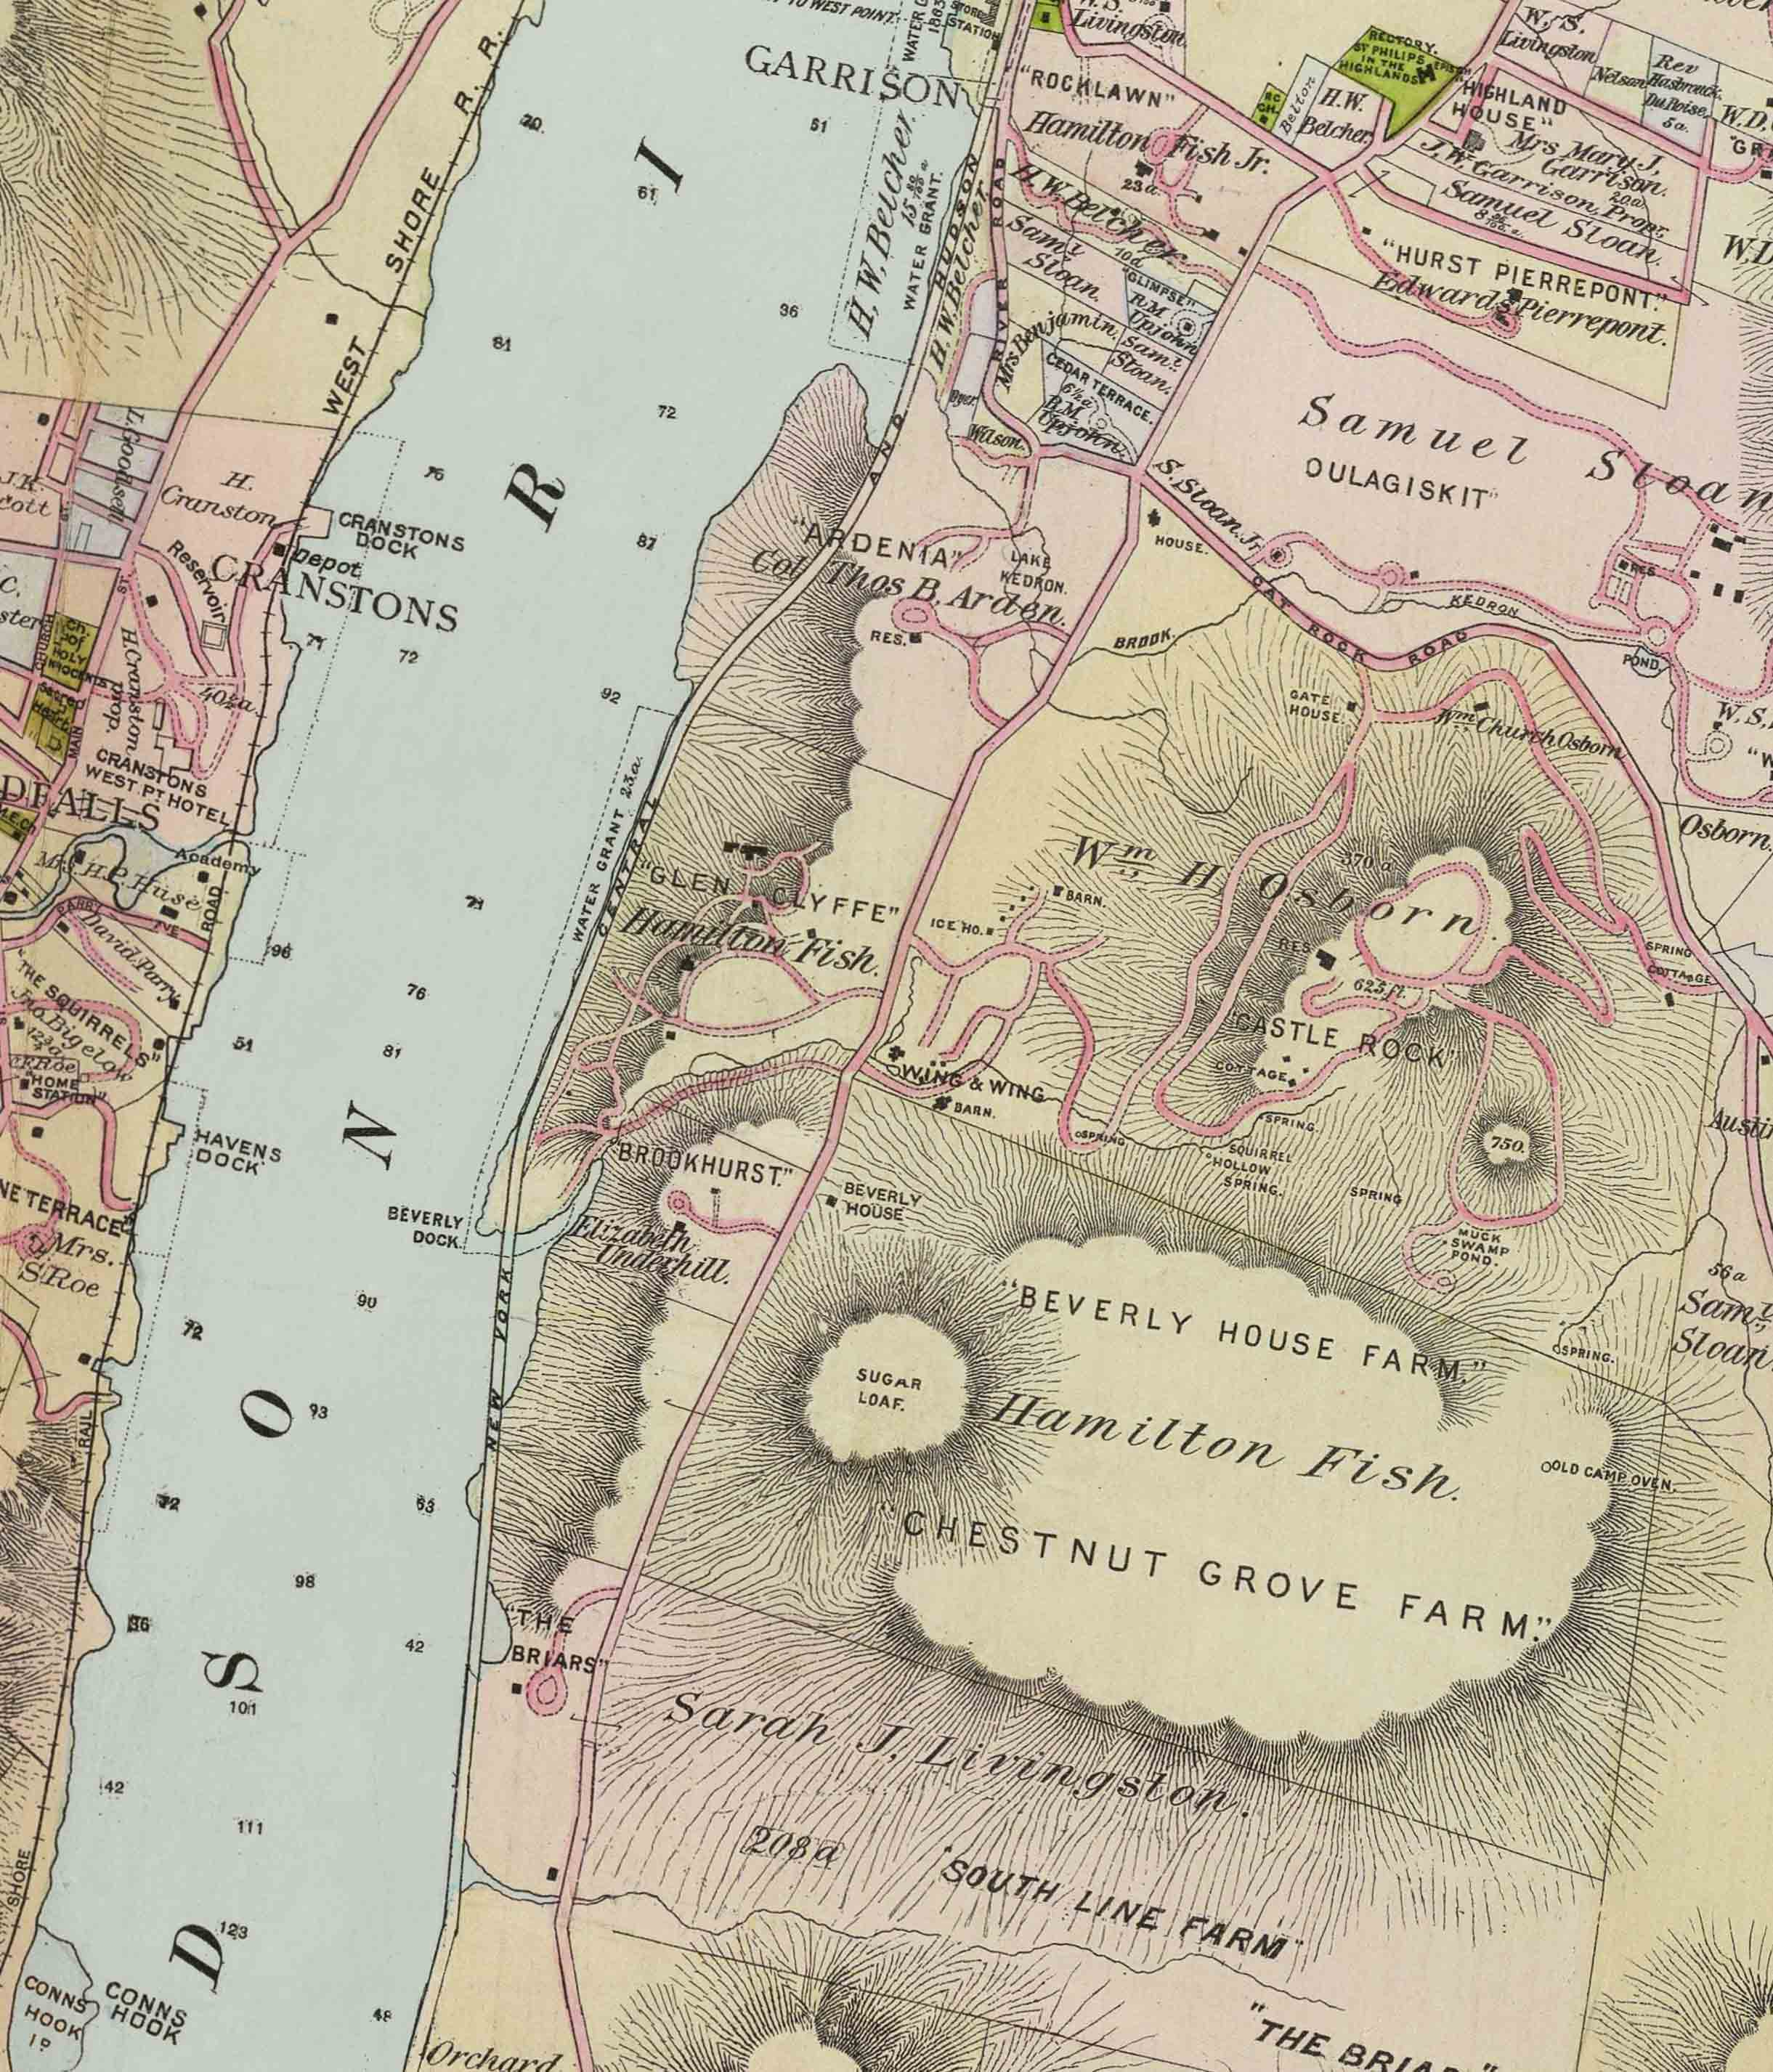 Garrison New York Map.New An 1891 Map Of Hudson River Estates Near West Point New York